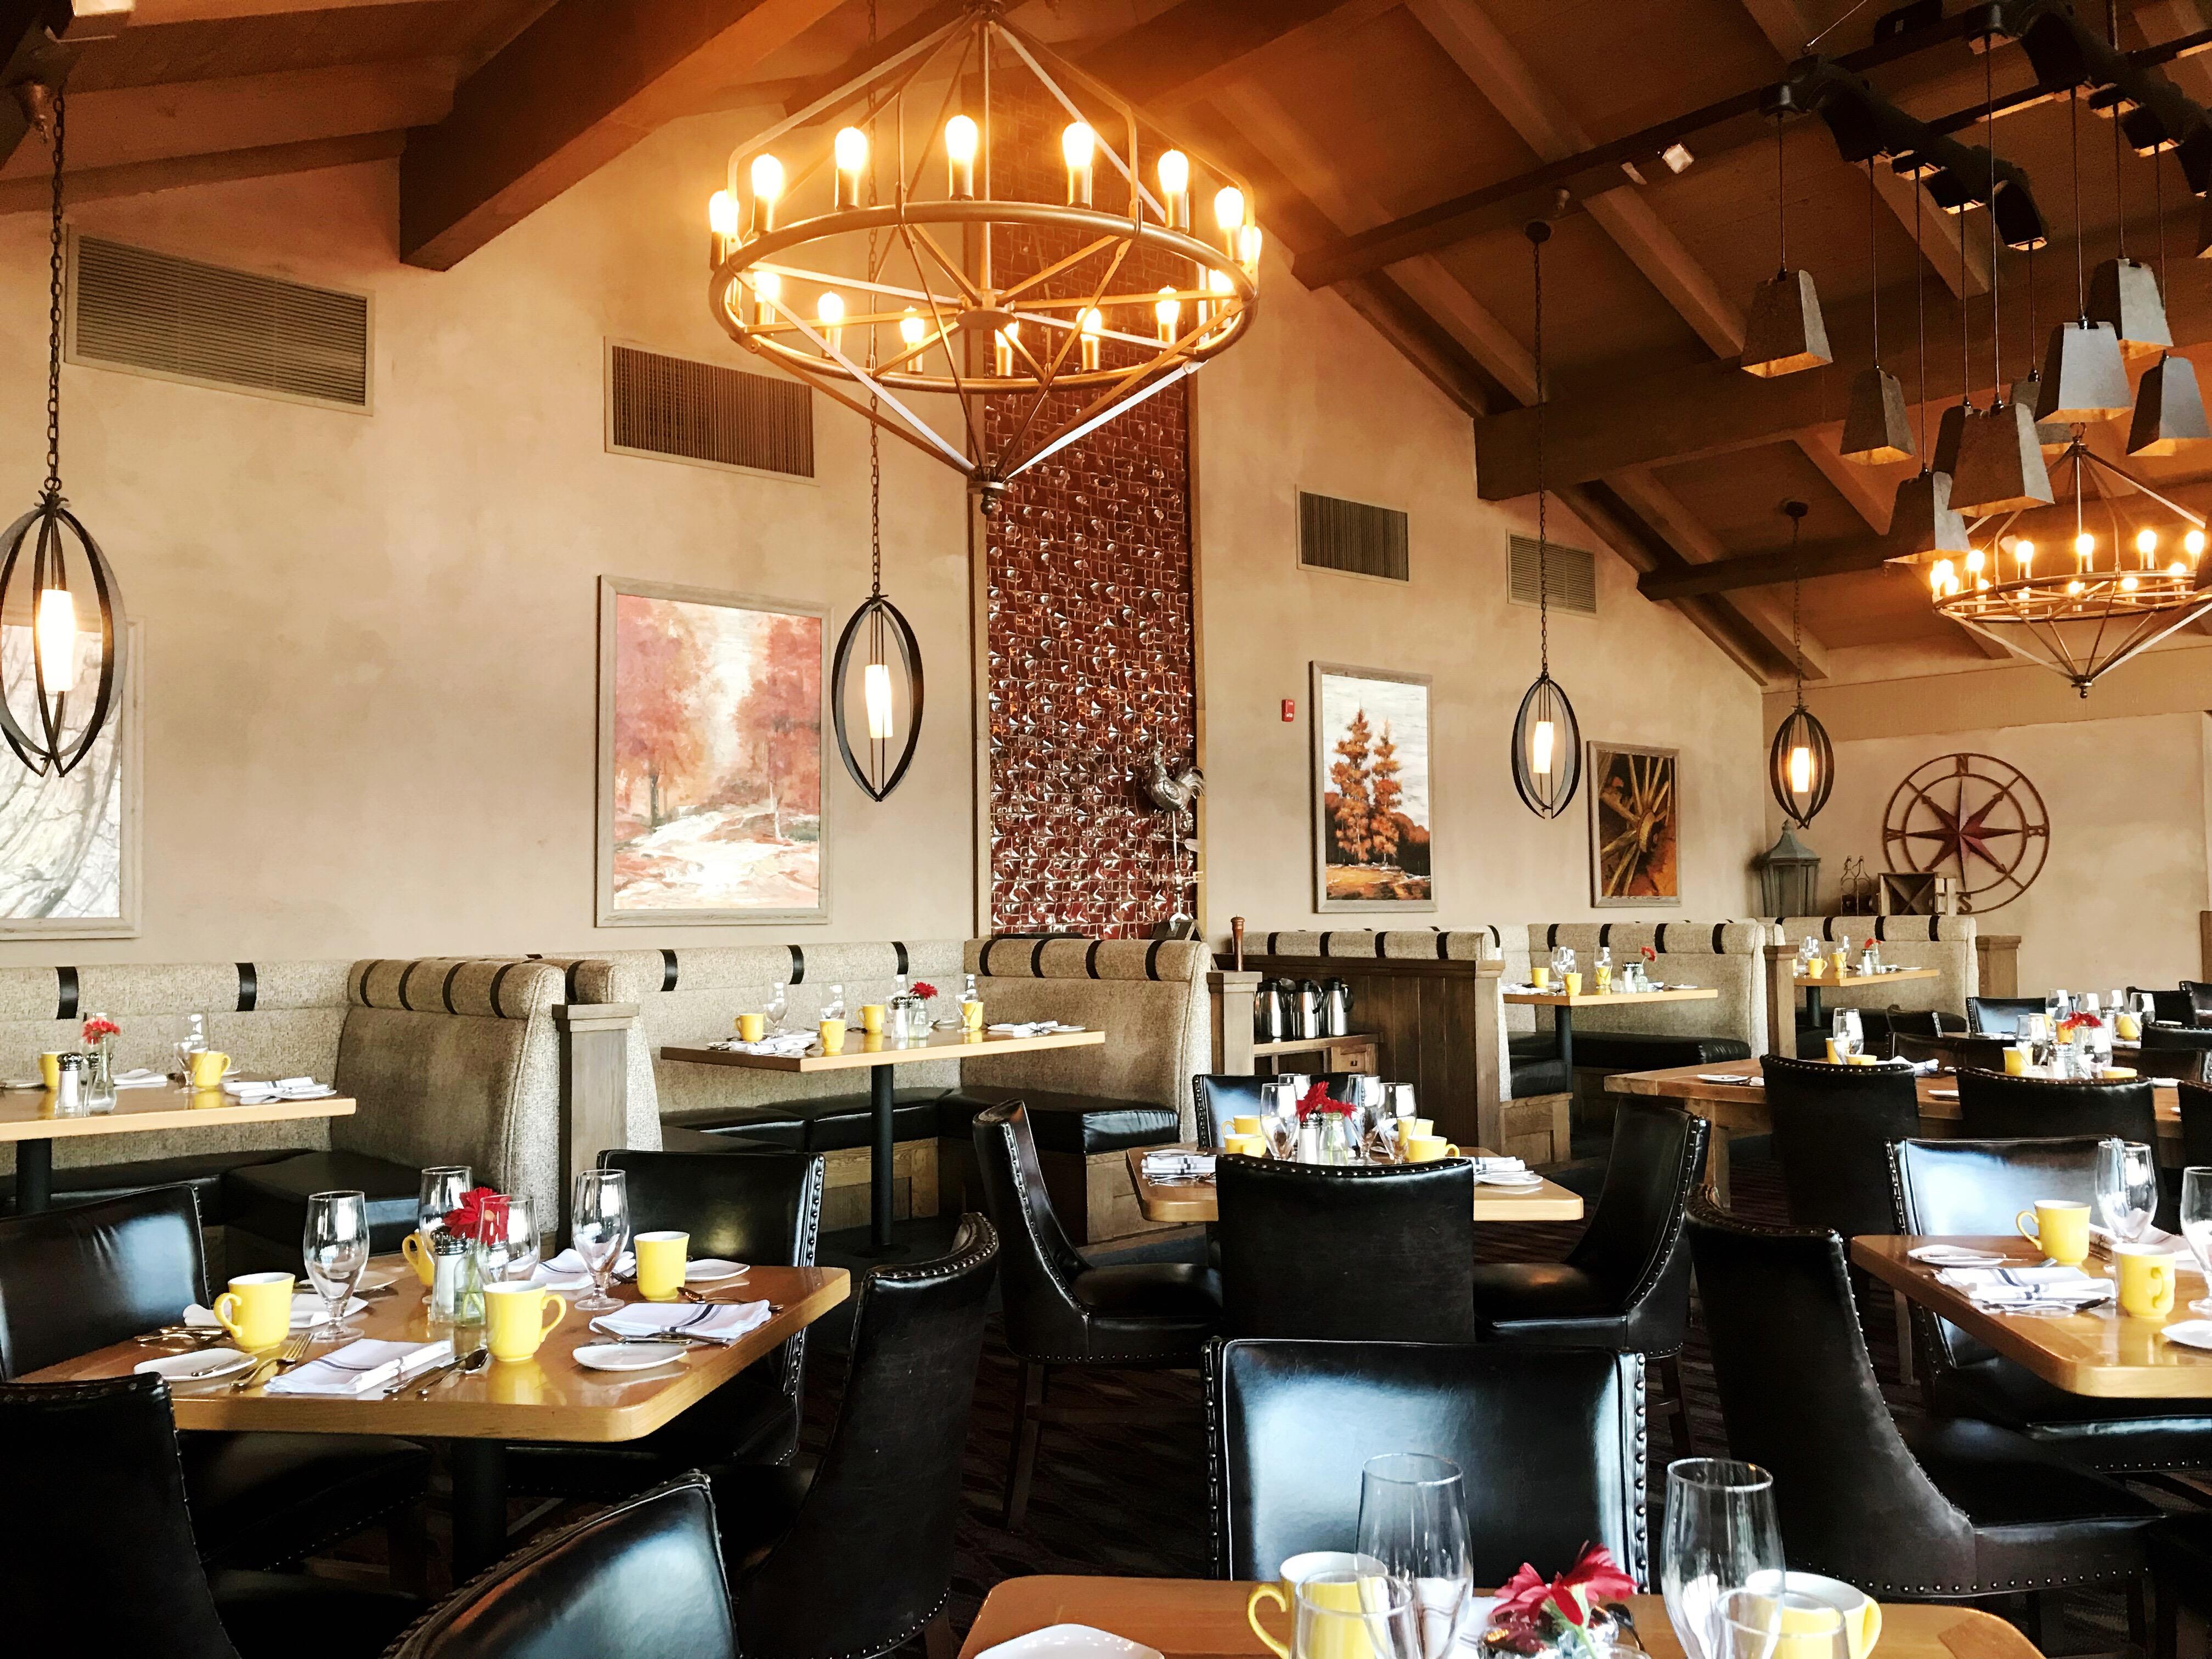 Cork Fire Kitchen Temecula Creek Inn - Simple Sojourns #TemeculaCreekInn #hotels #resorts #GolfResort #Temecula